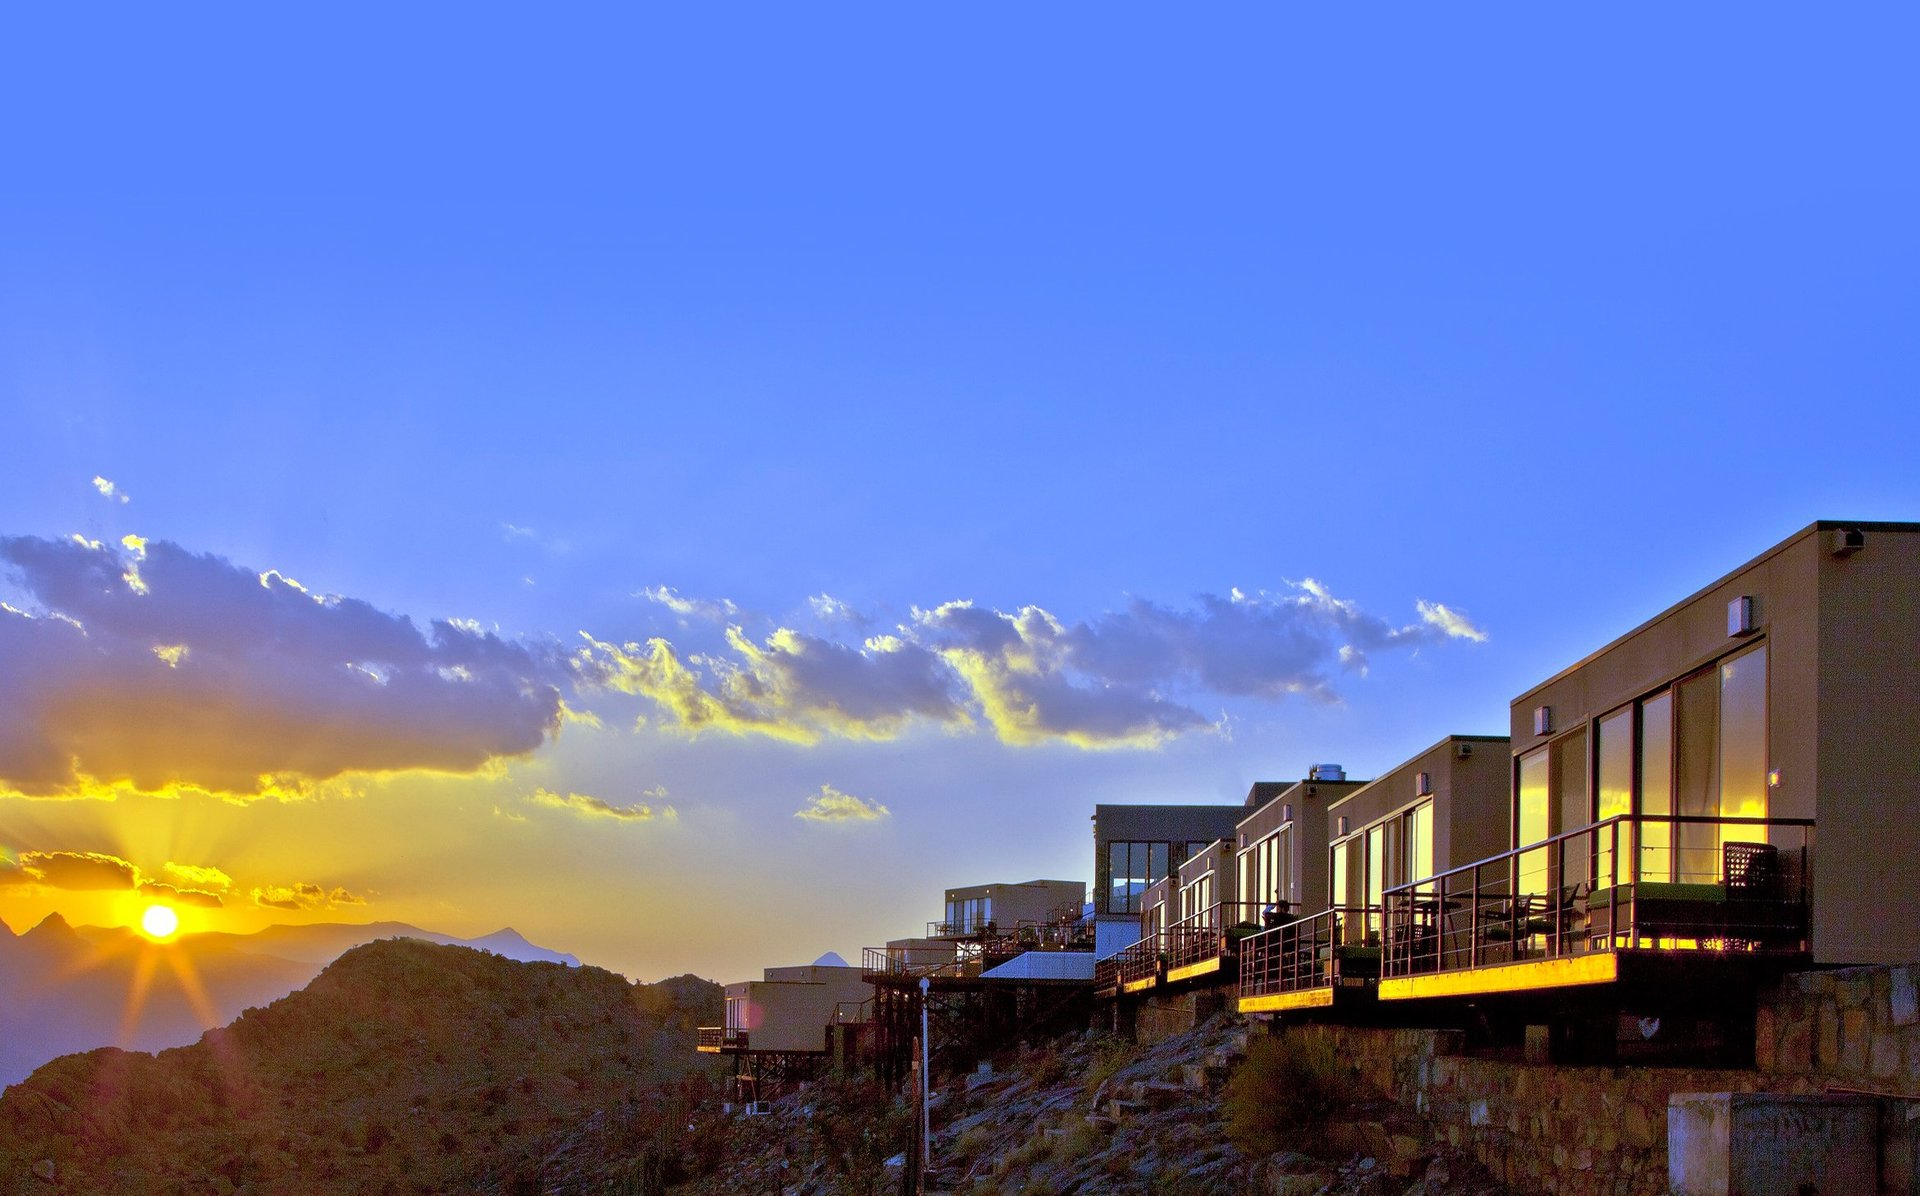 Hotel The View - Jebel Shams